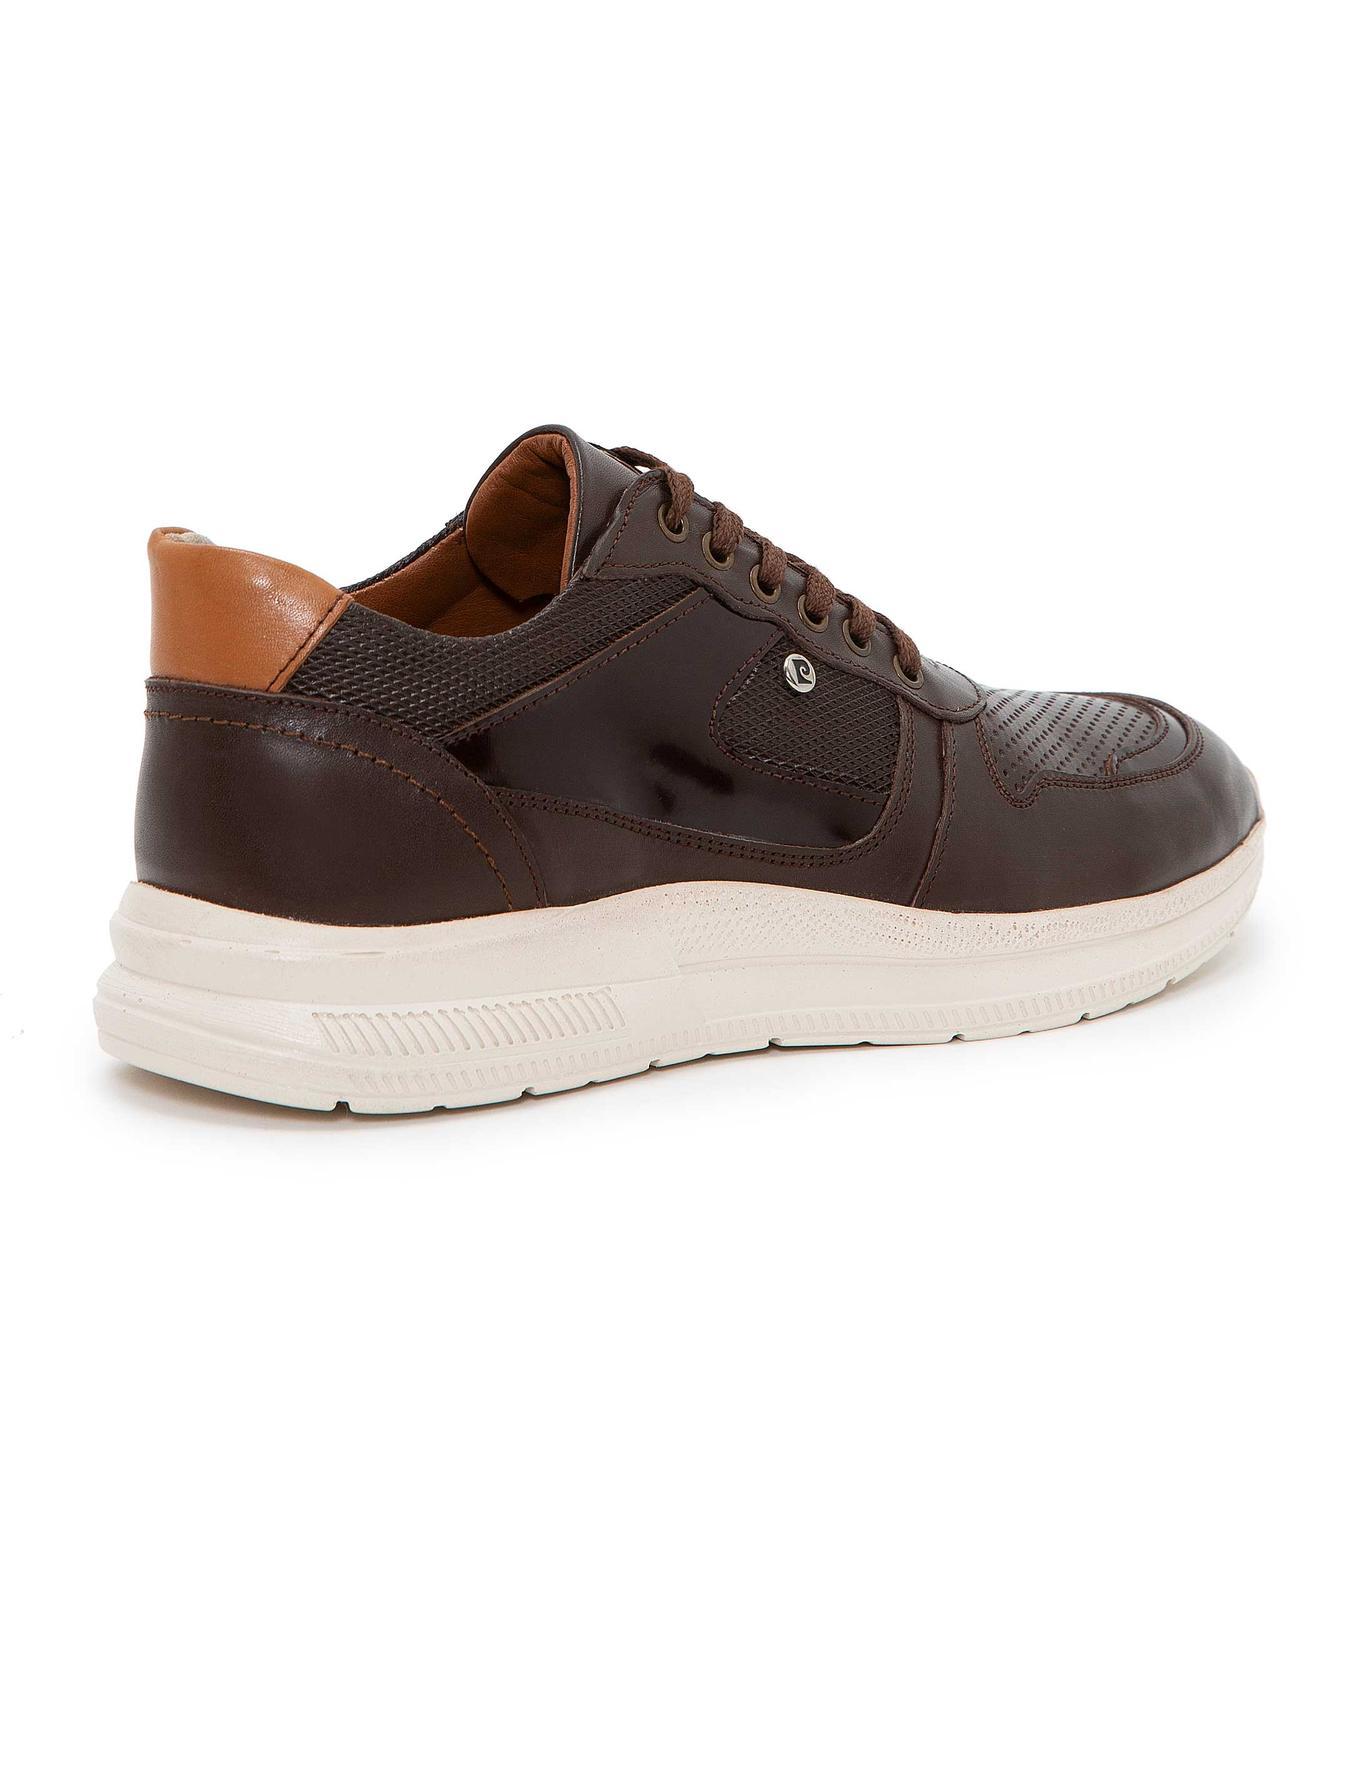 Kahverengi Sneakers Ayakkabı